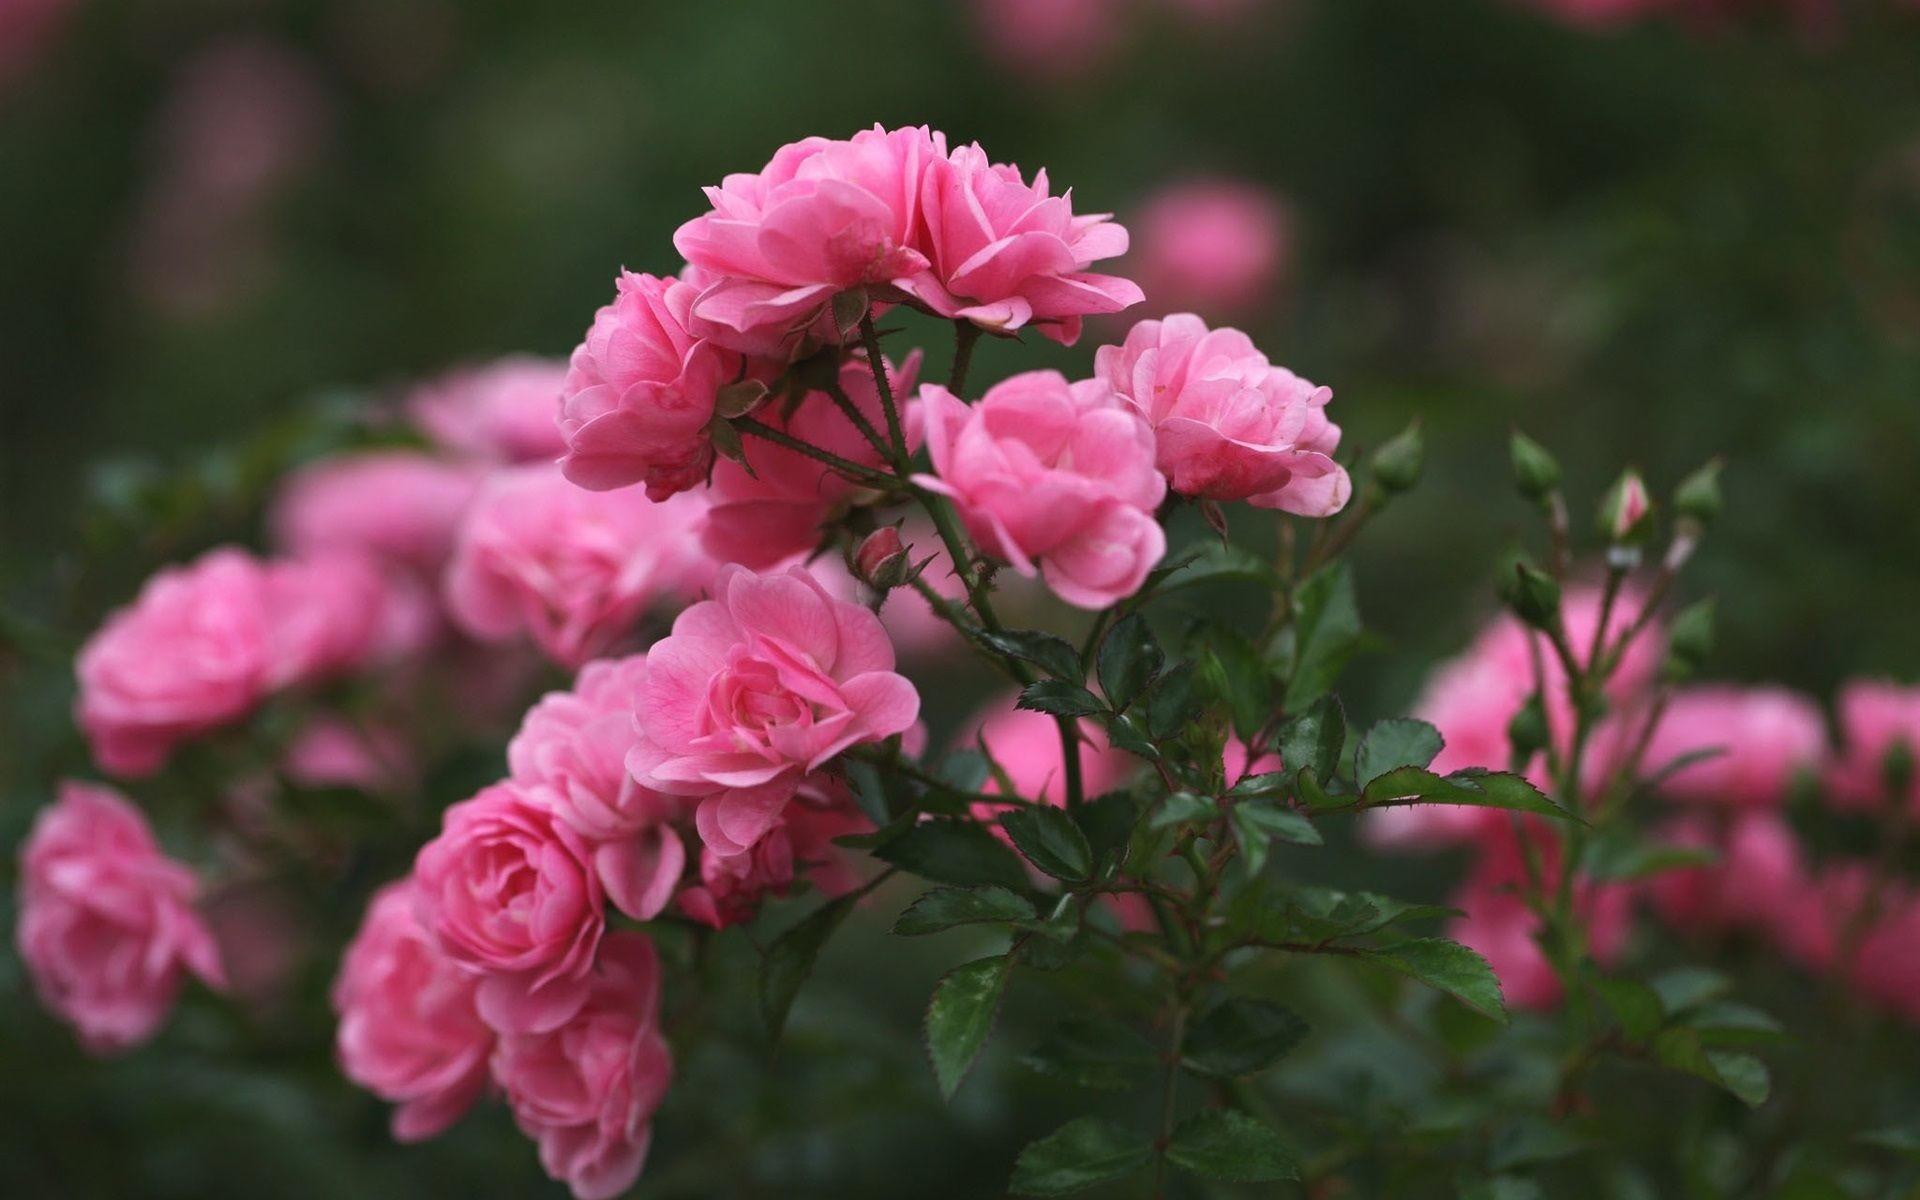 desktop wallpaper rose flowers: Roses Wallpaper For Desktop (46+ Images